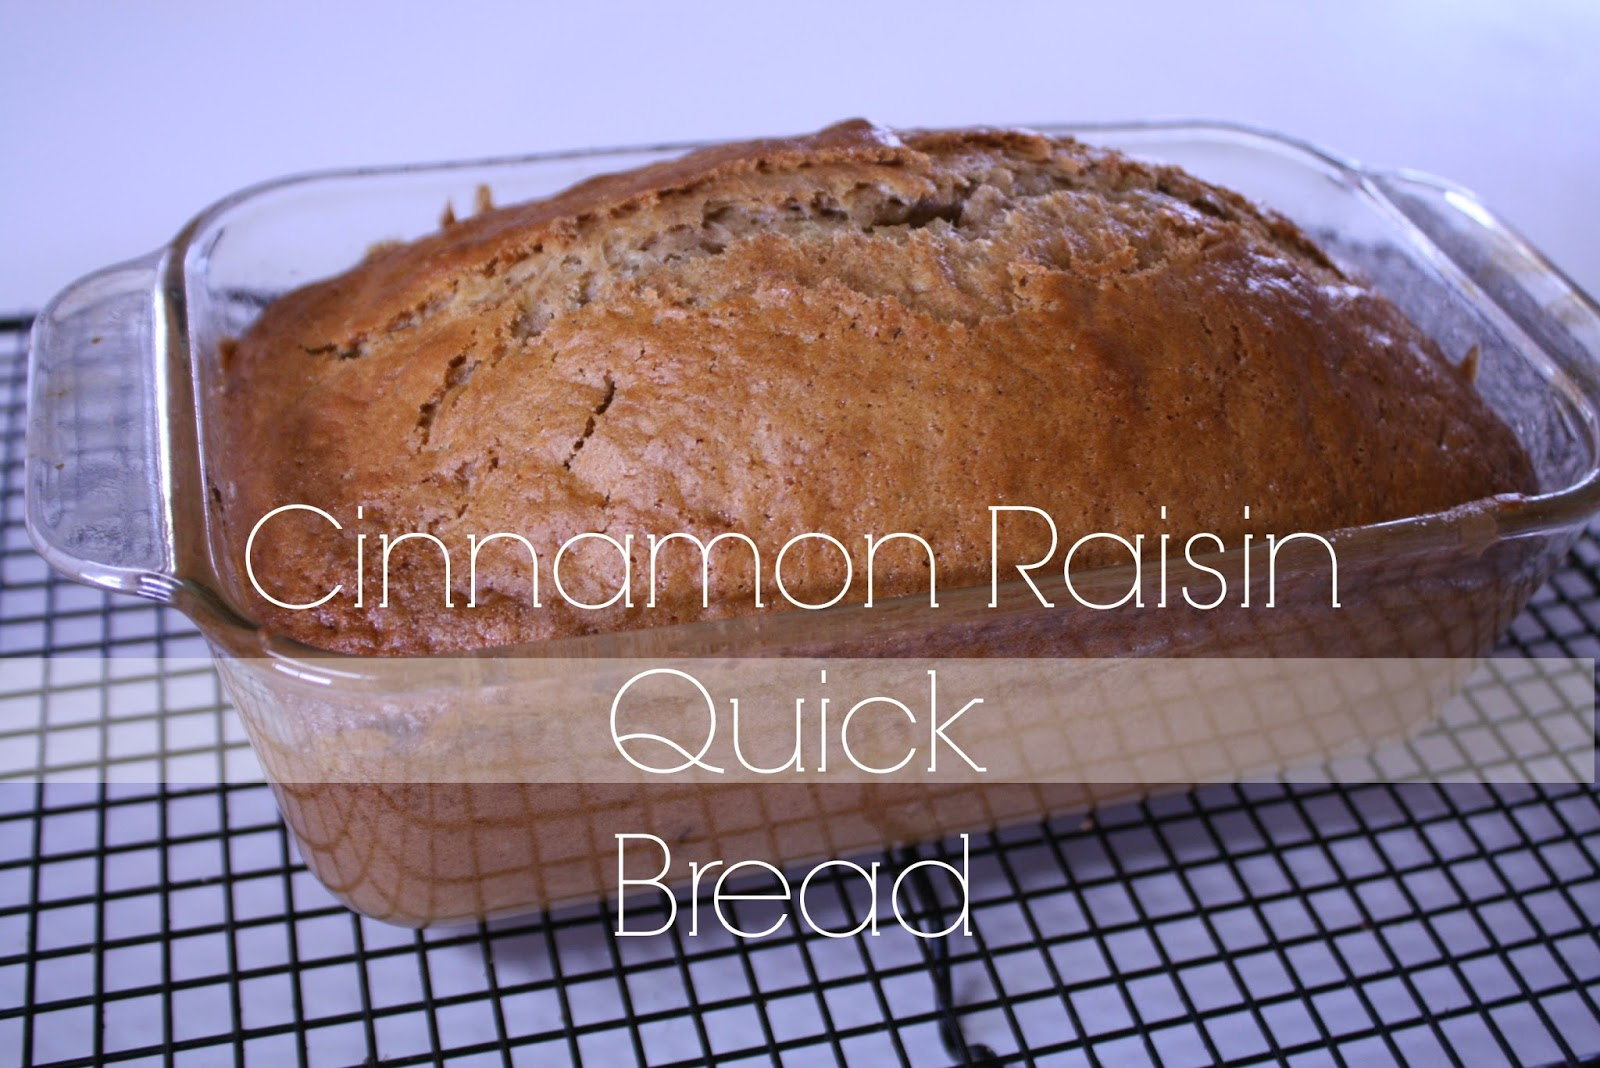 http://myjourneyforhim.blogspot.com/p/cinnamon-raisin-quick-bread.html